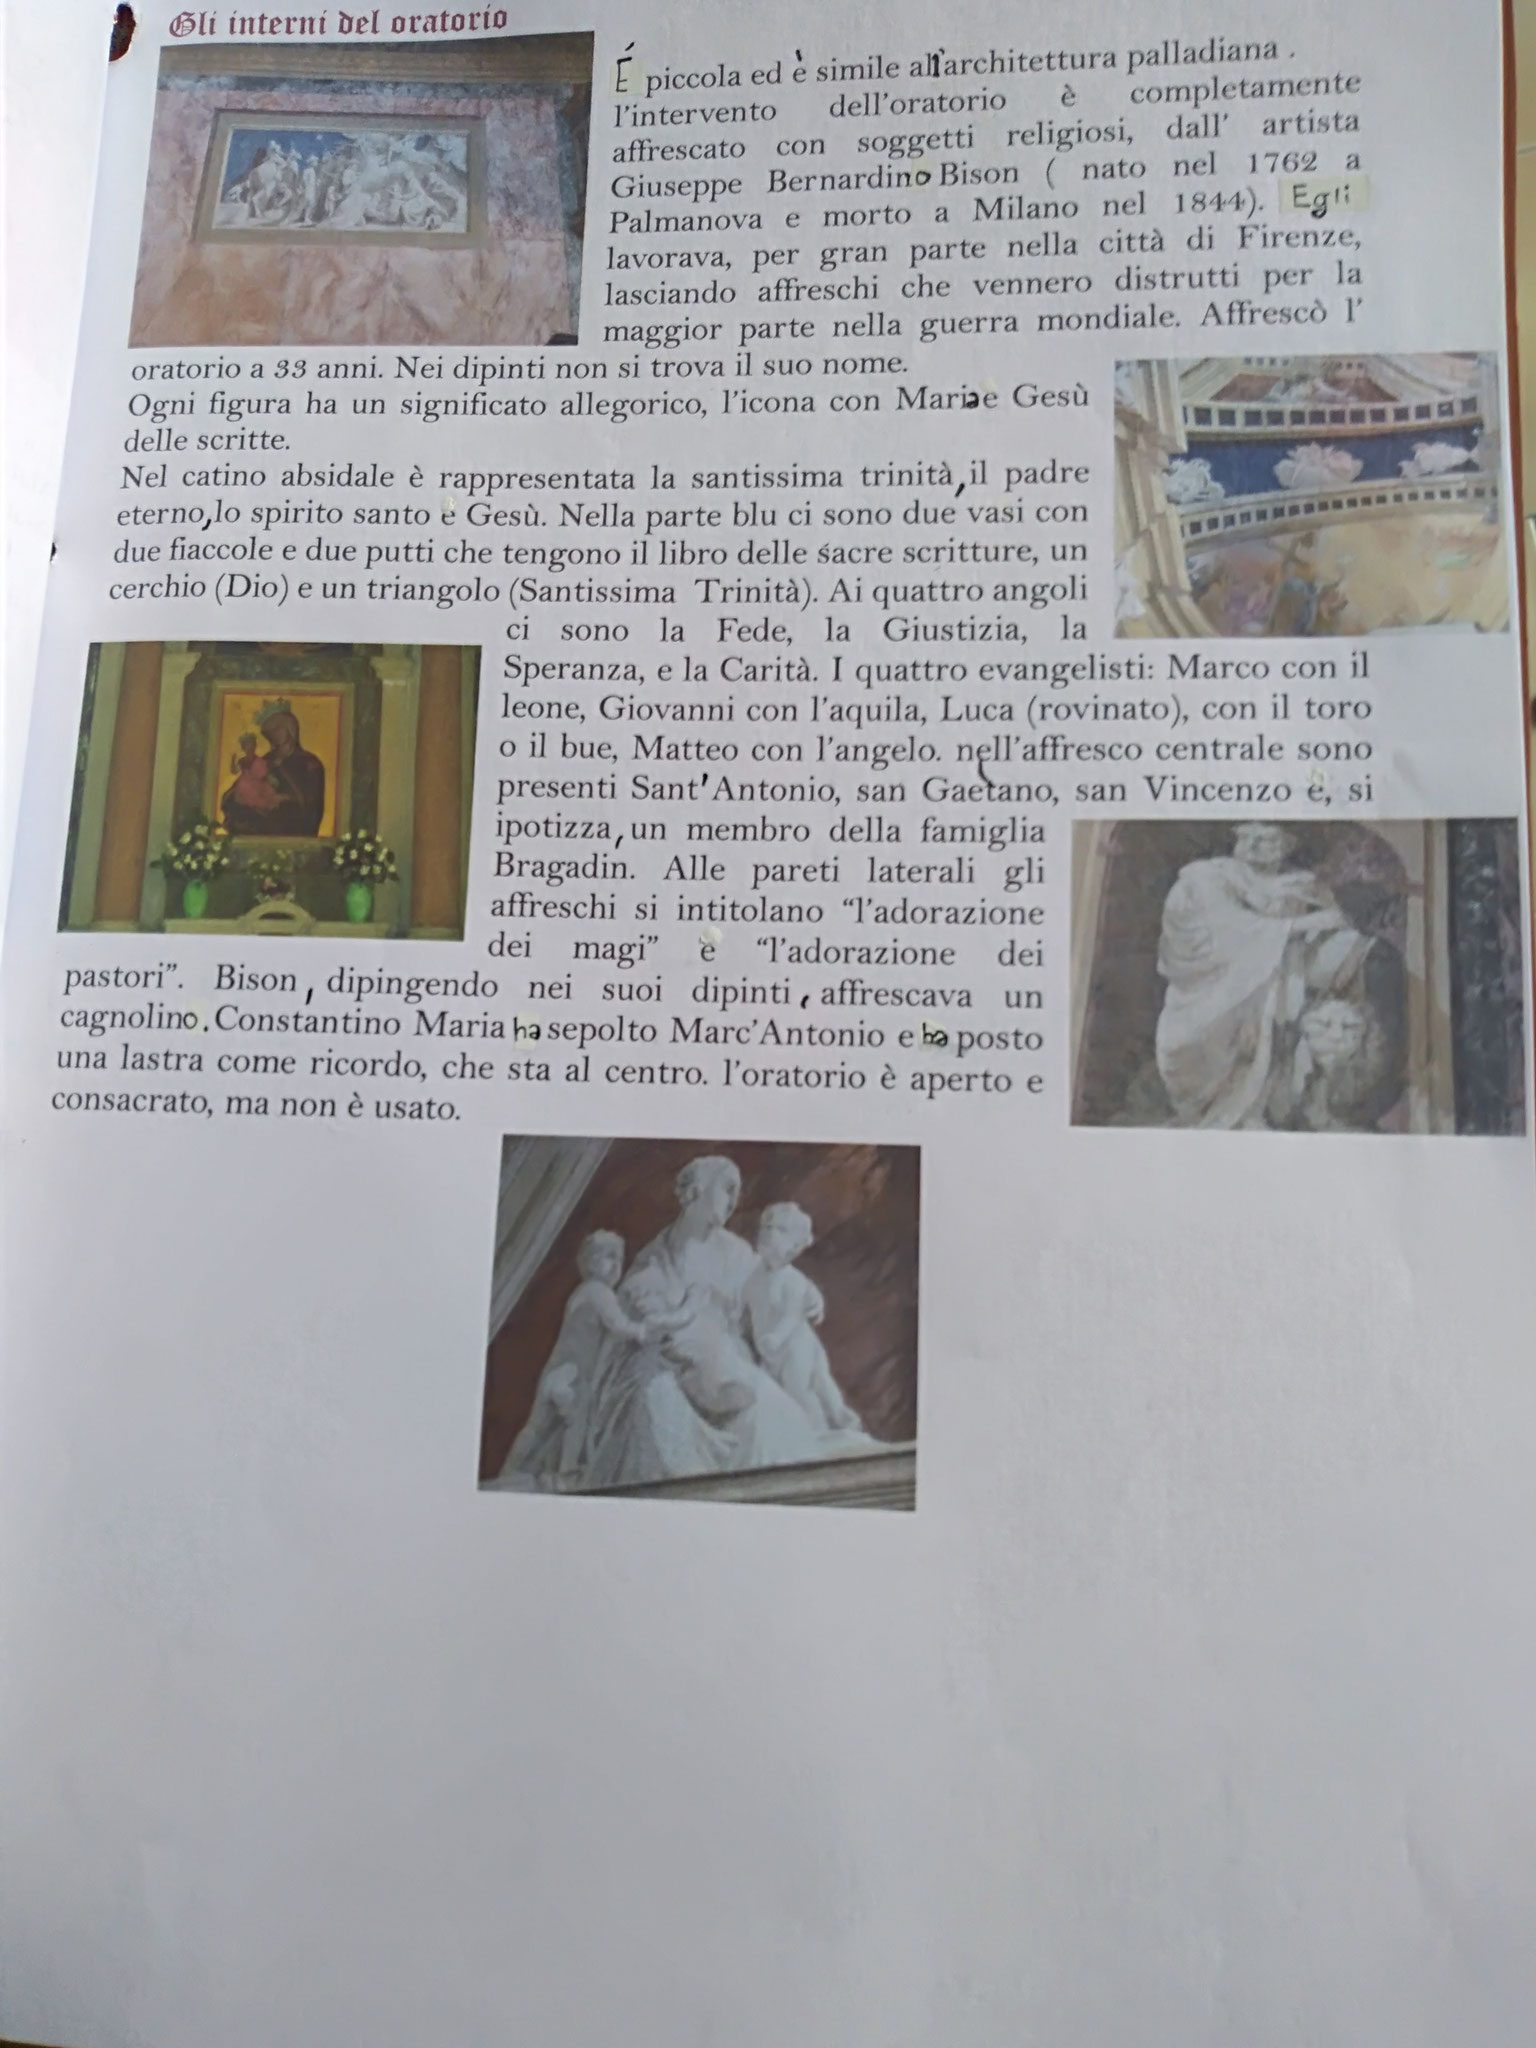 7 L'oratorio Bragadin